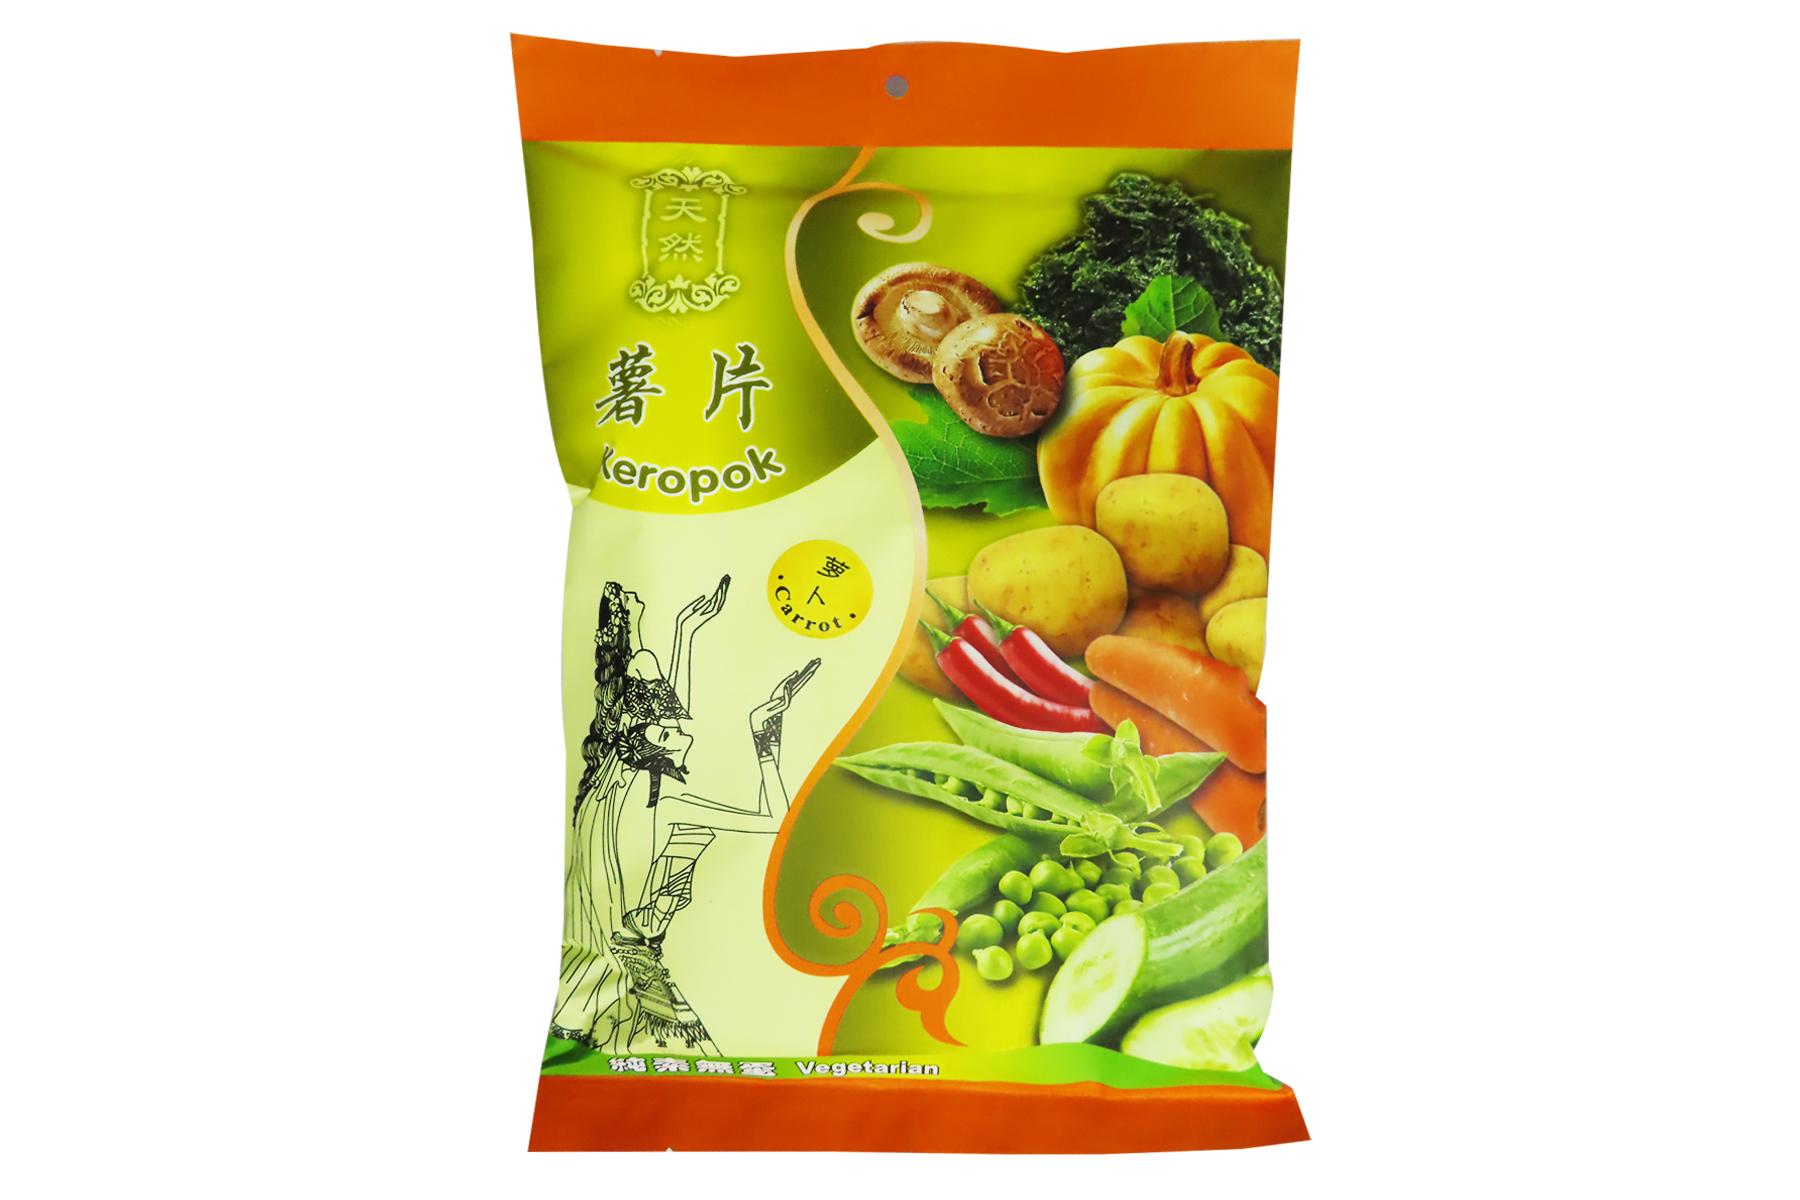 Image Kun Yi Carrot Cracker 昆益 - 罗卜薯片 40grams